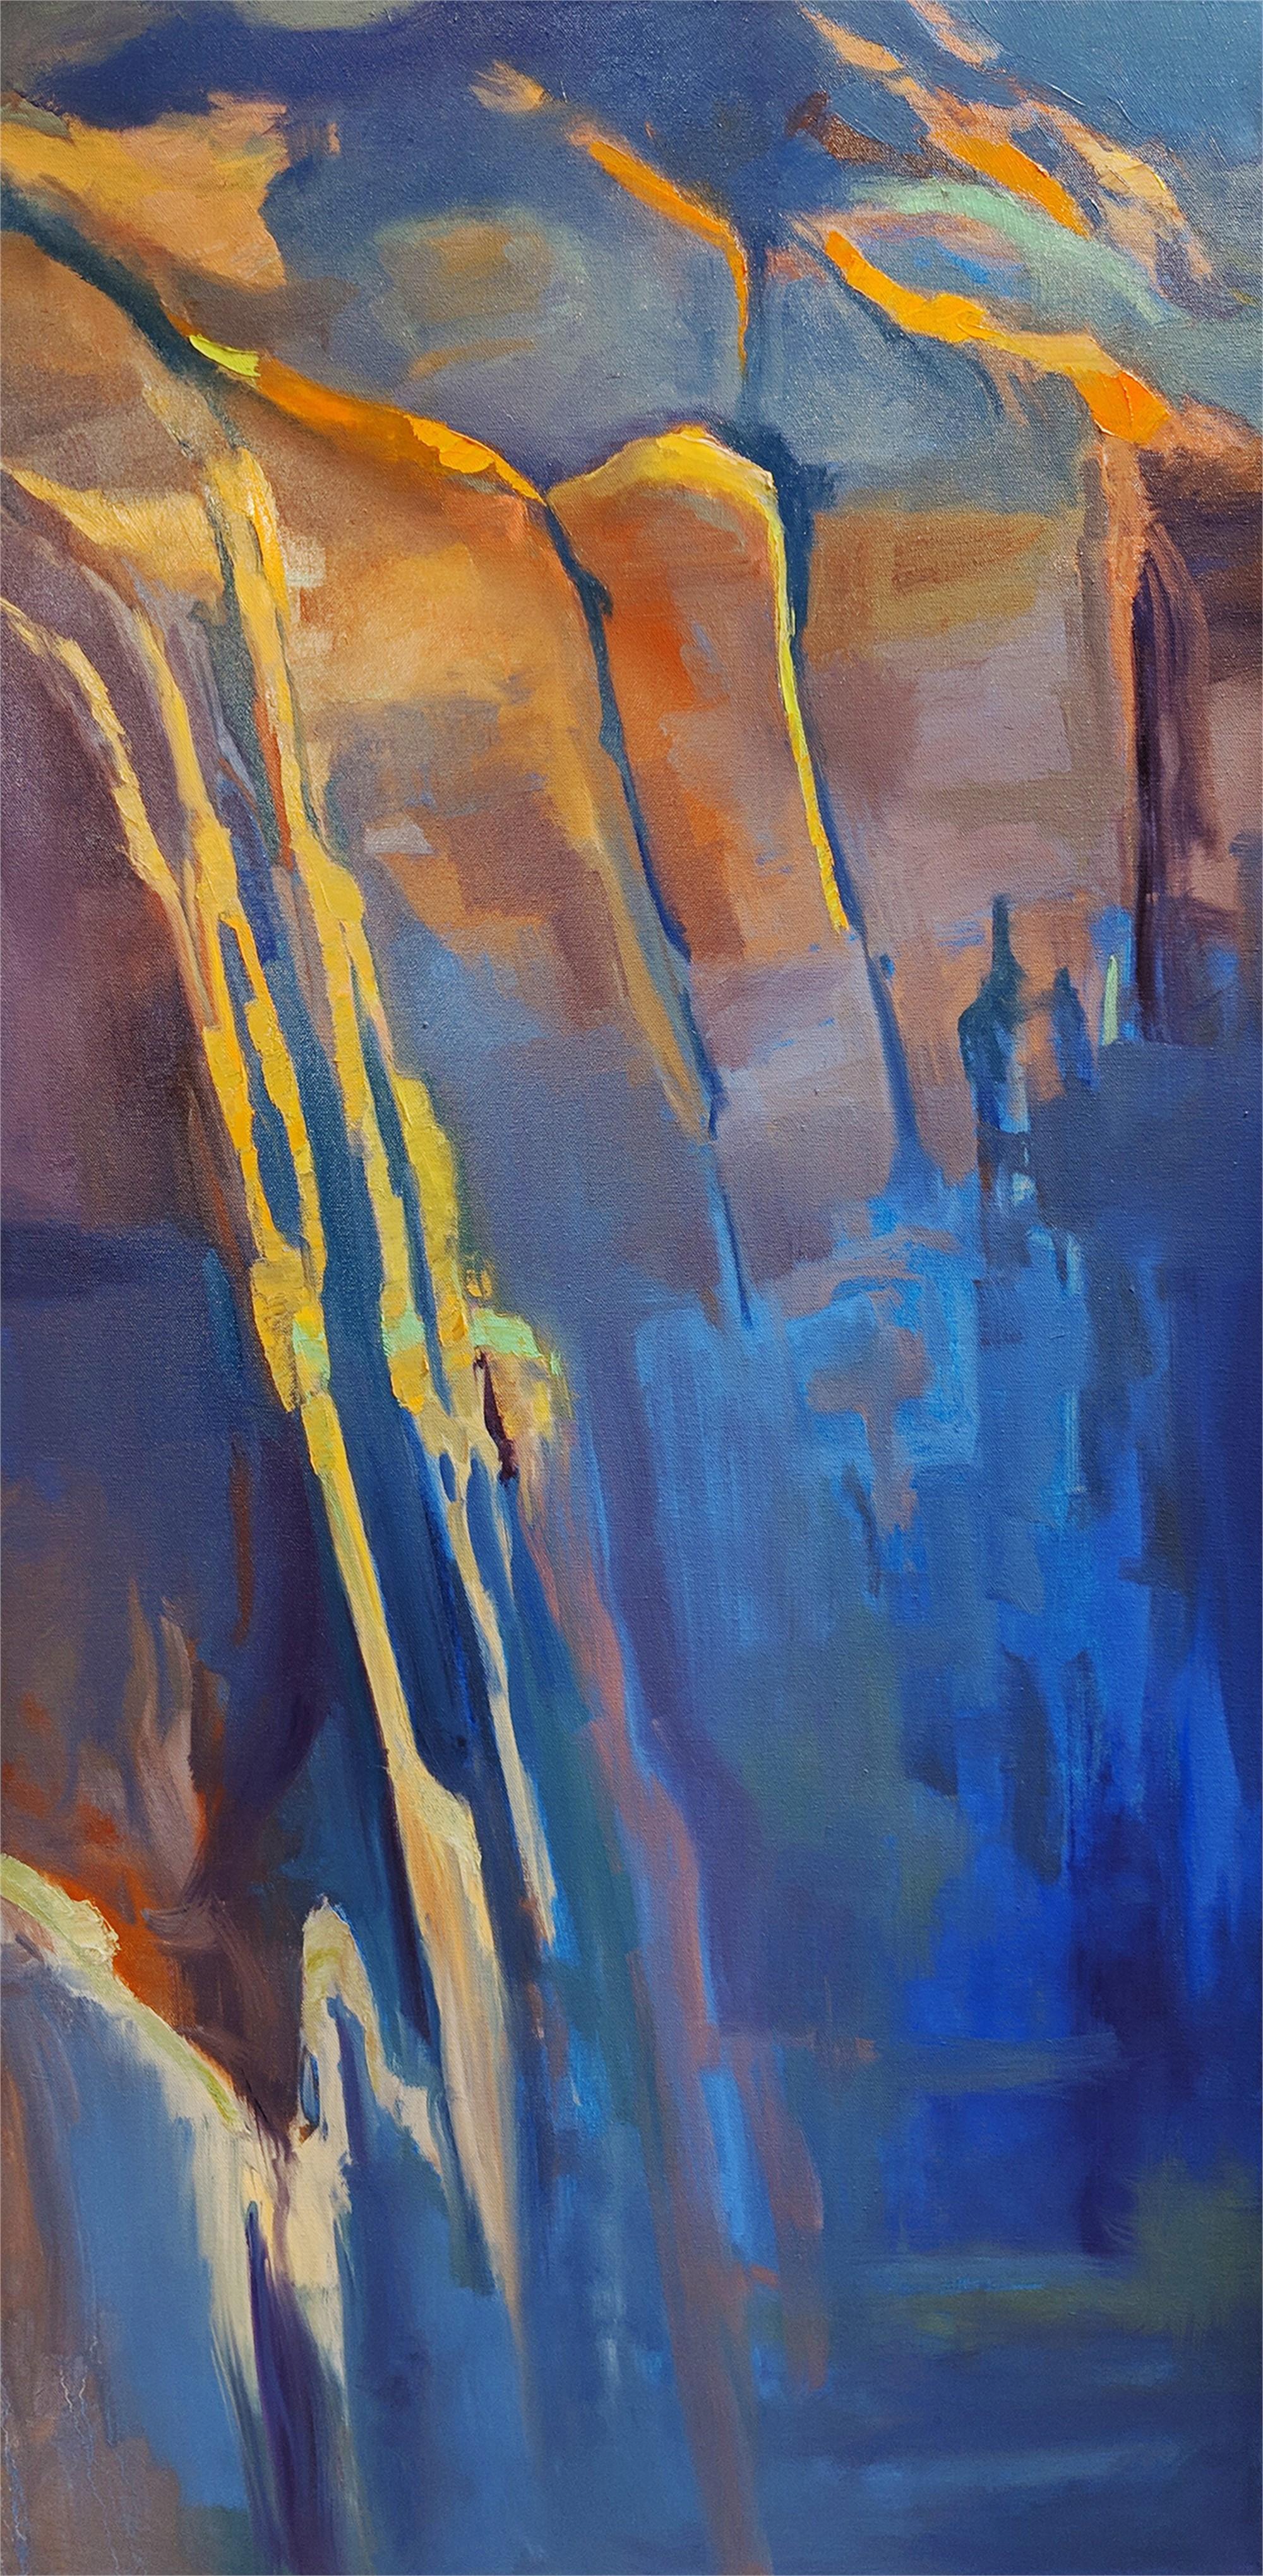 Mystic Passage by Craig Freeman